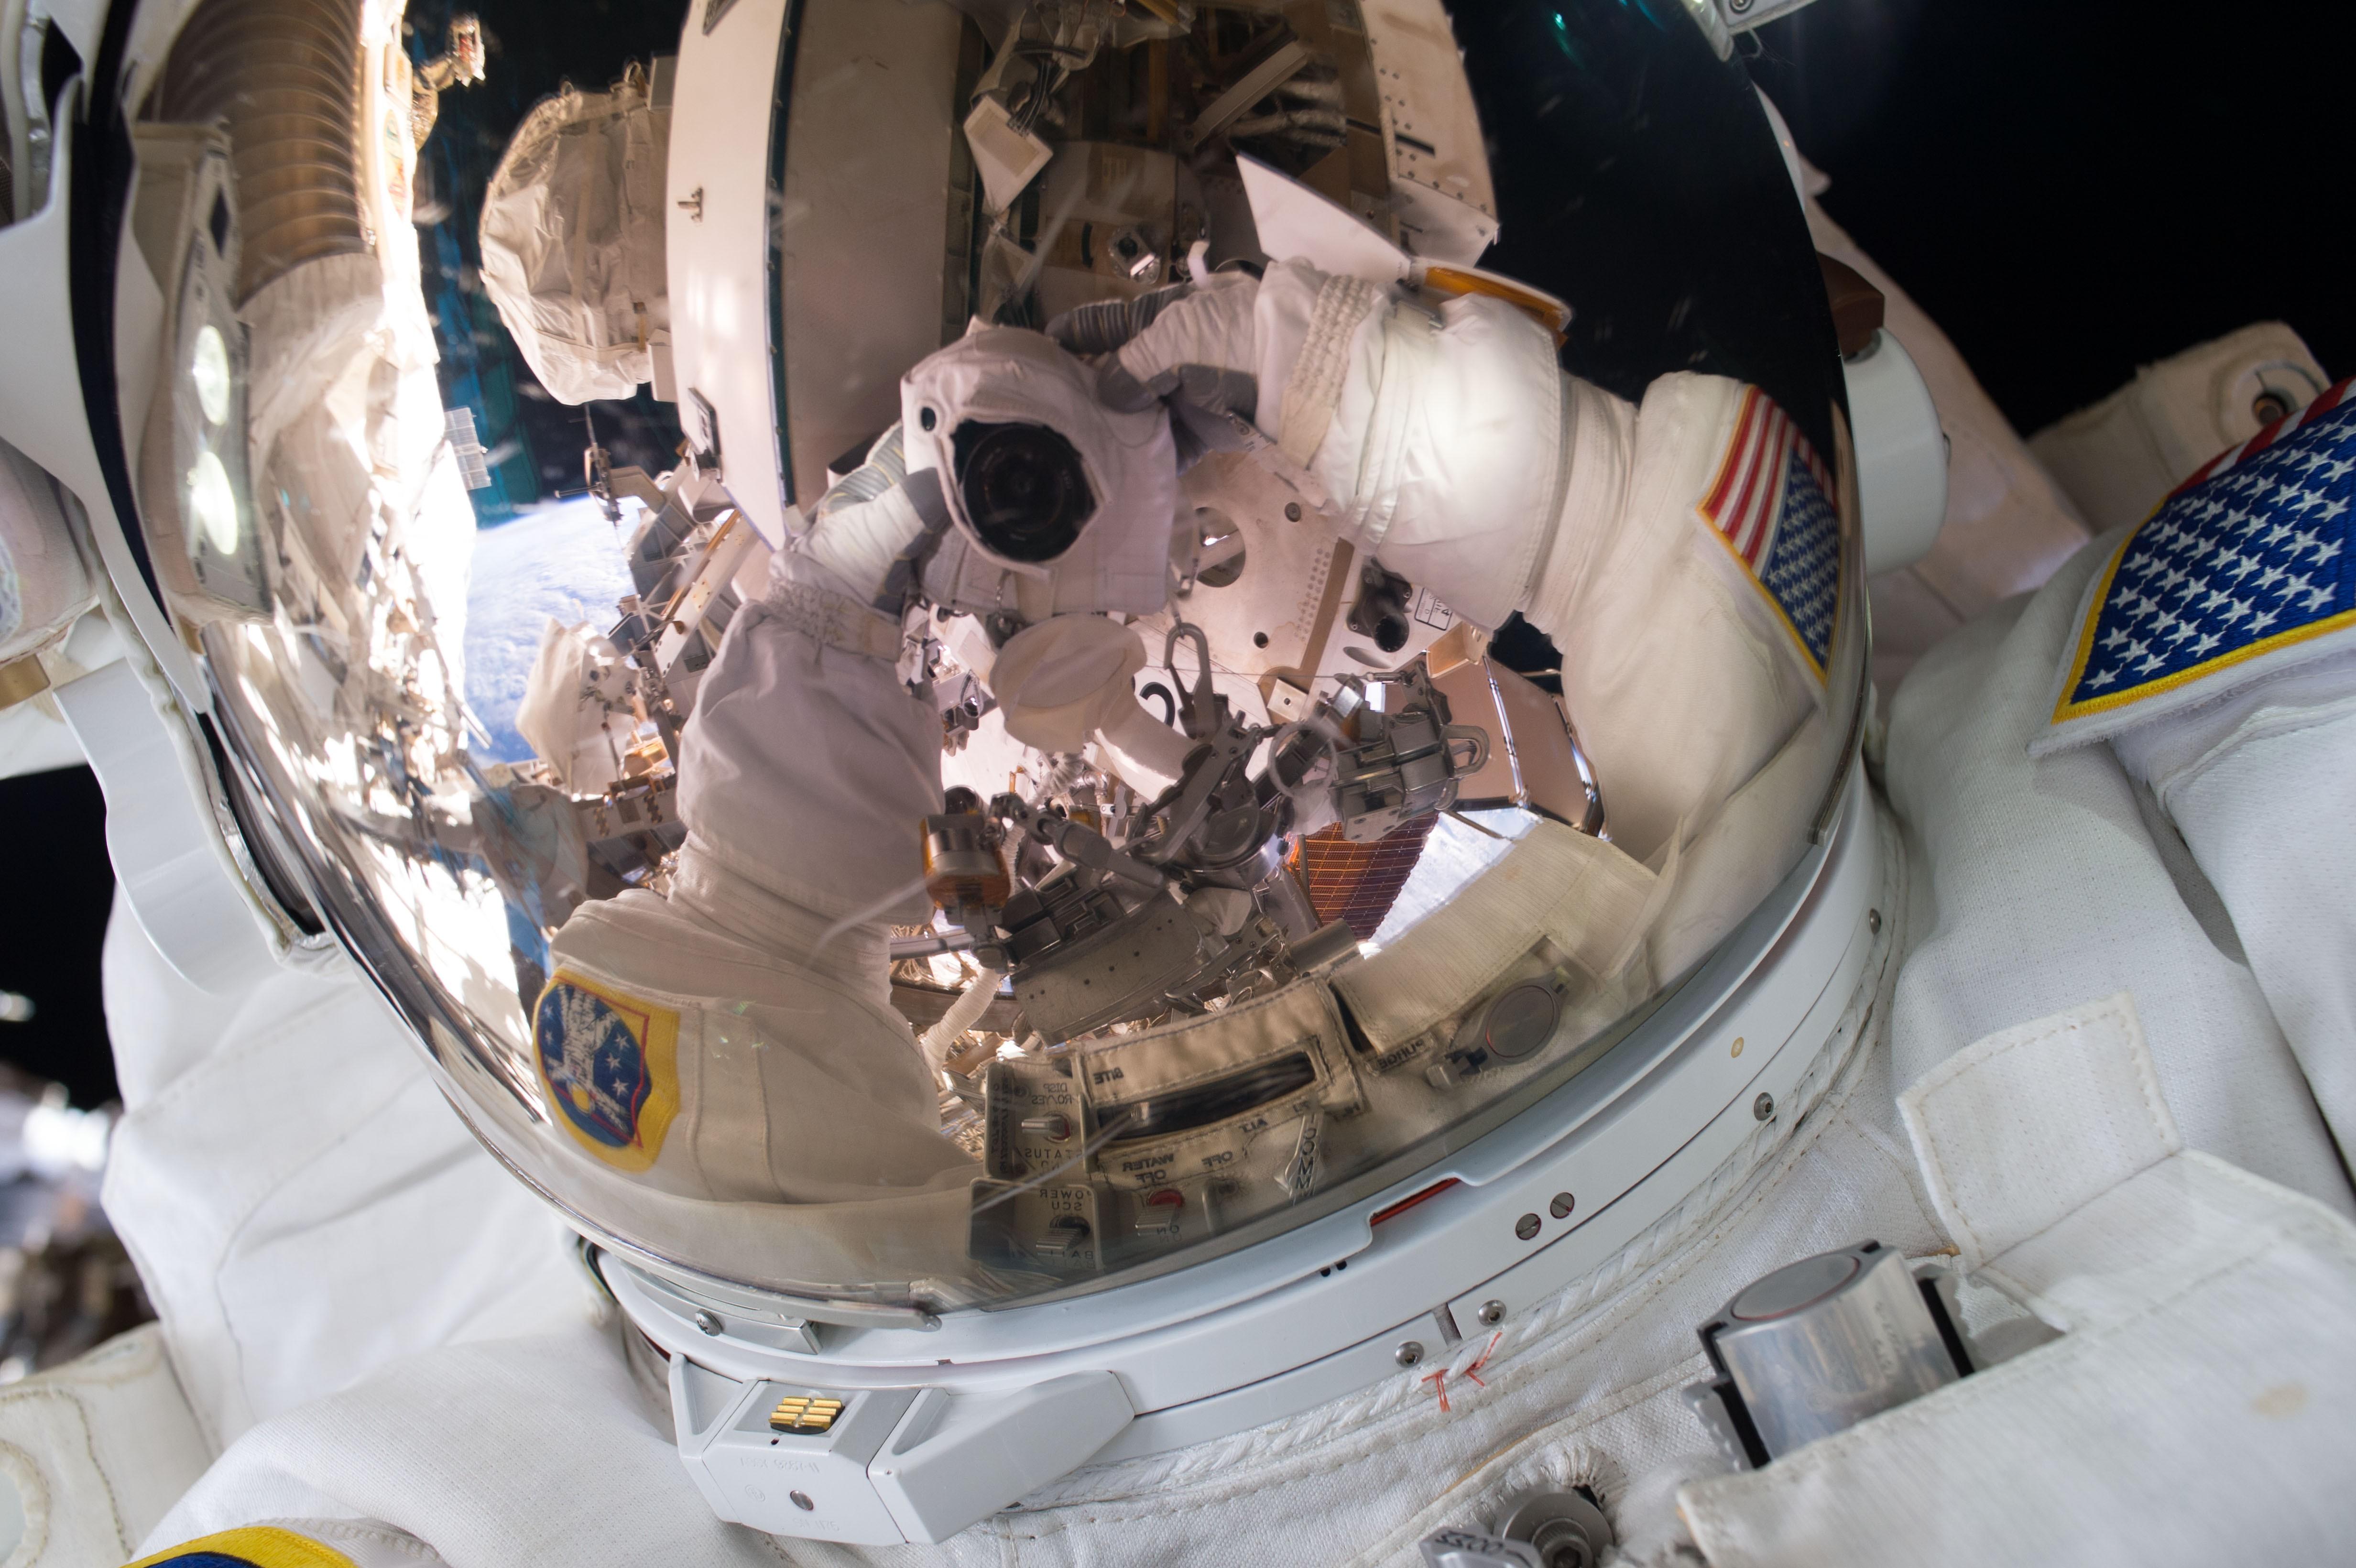 General 4928x3280 space universe astronaut